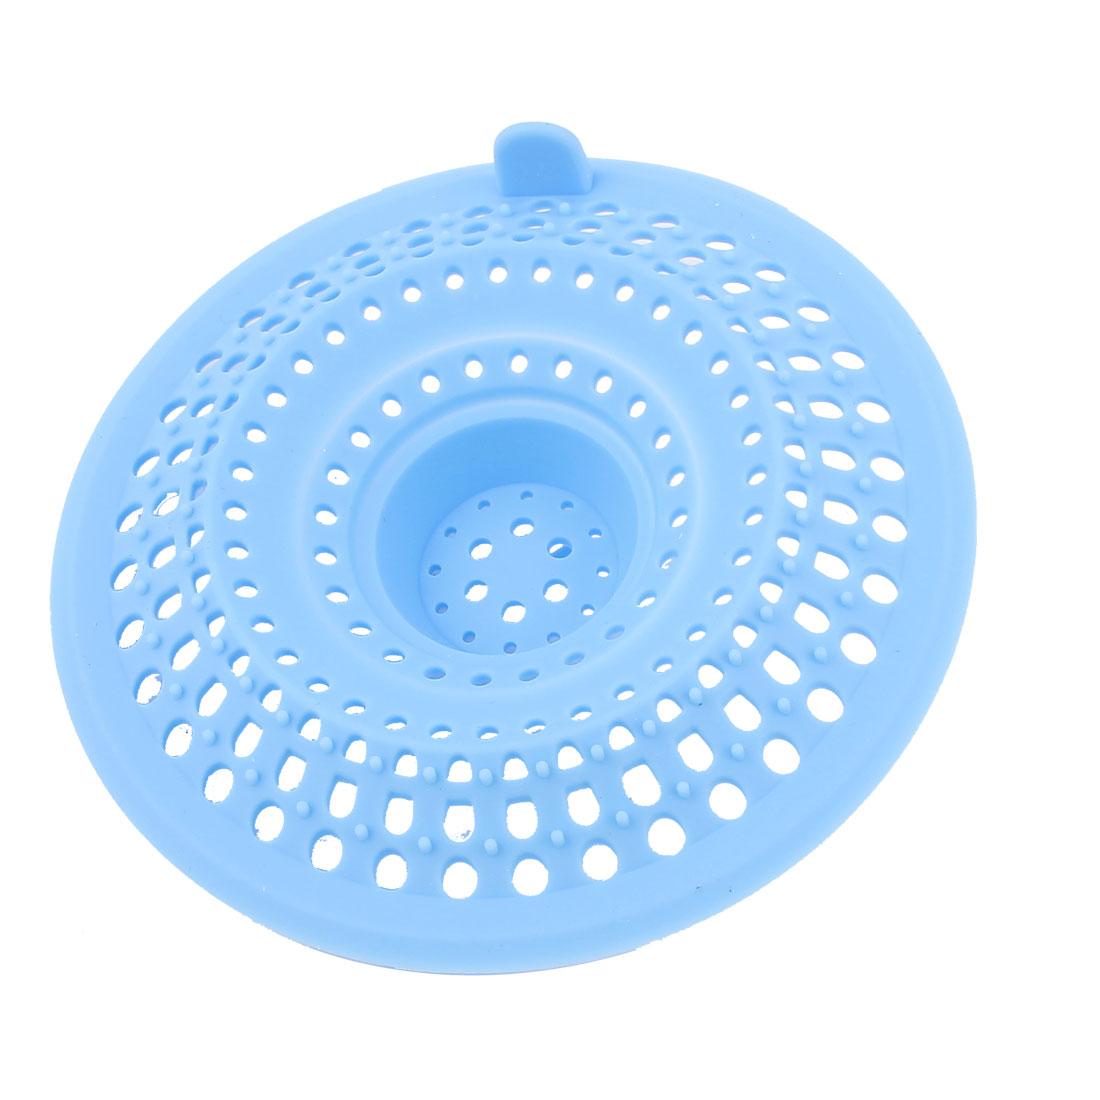 Bathroom Blue Silicone Mesh Hole Design Sink Strainer Basket Bath Basin Shower Stopper Drain Bathtub Net